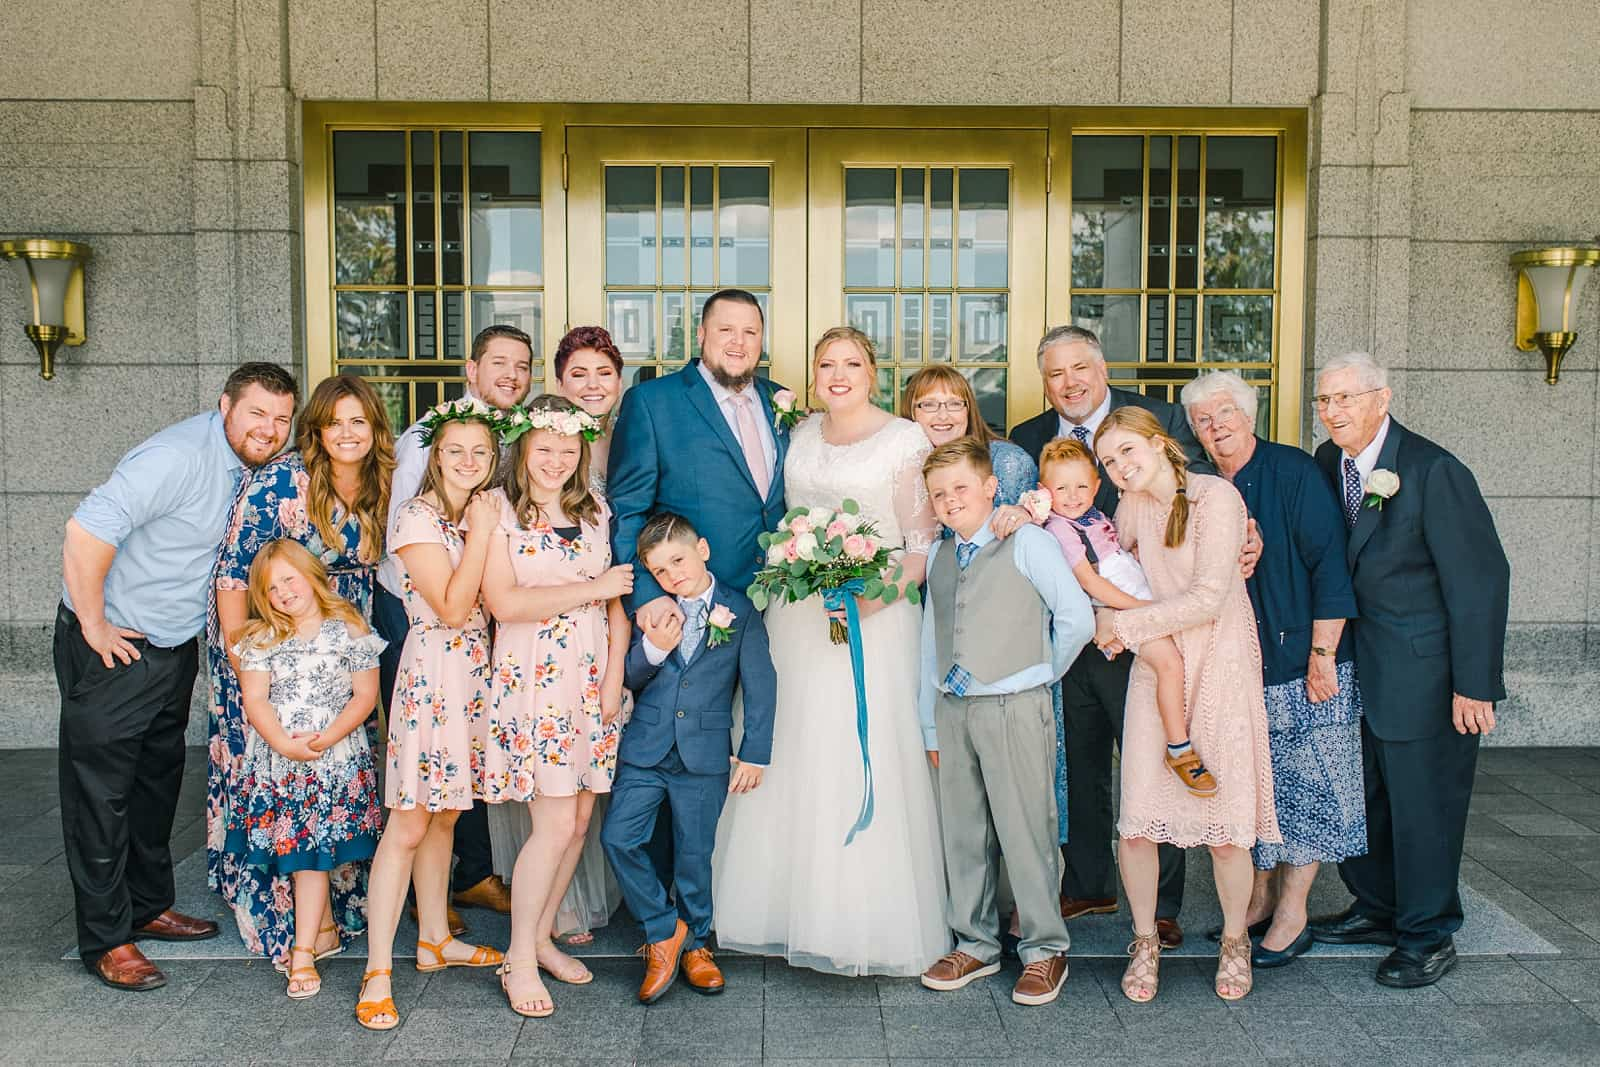 Draper LDS Temple Wedding, Utah wedding photography, summer backyard wedding